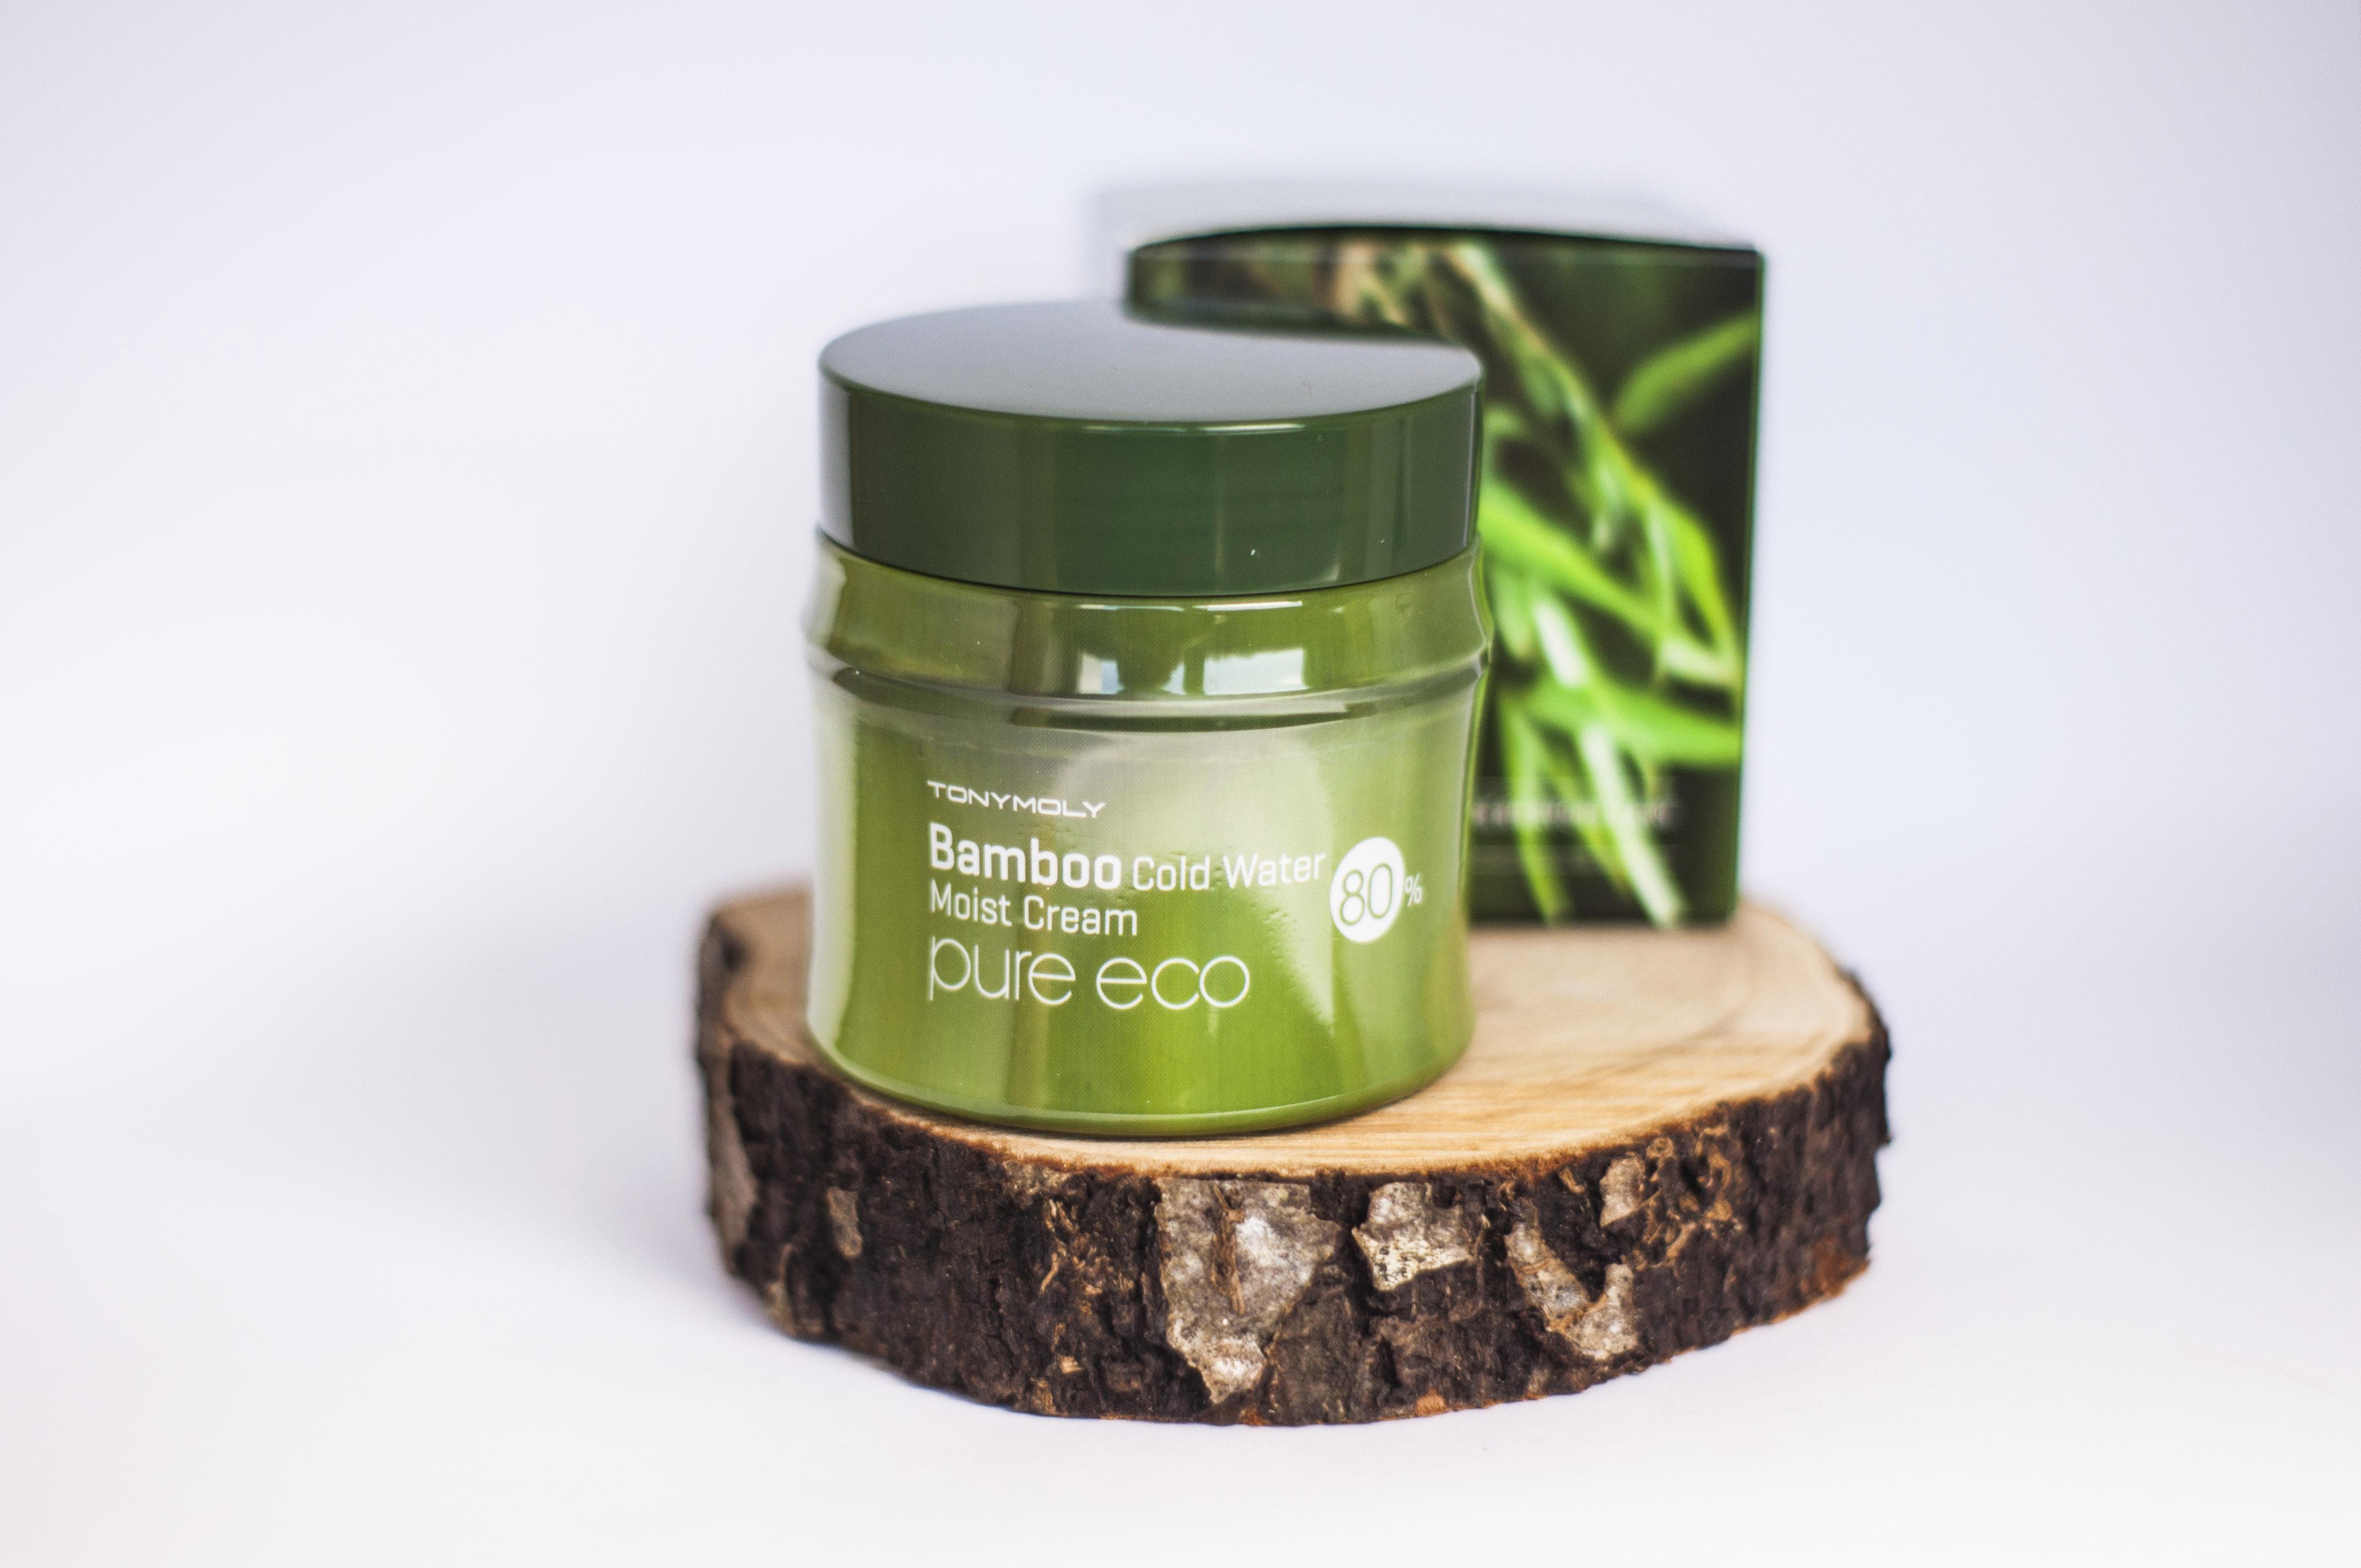 Tonymoly Bamboo Cold Water Moist Cream Blueberry Cosmetics